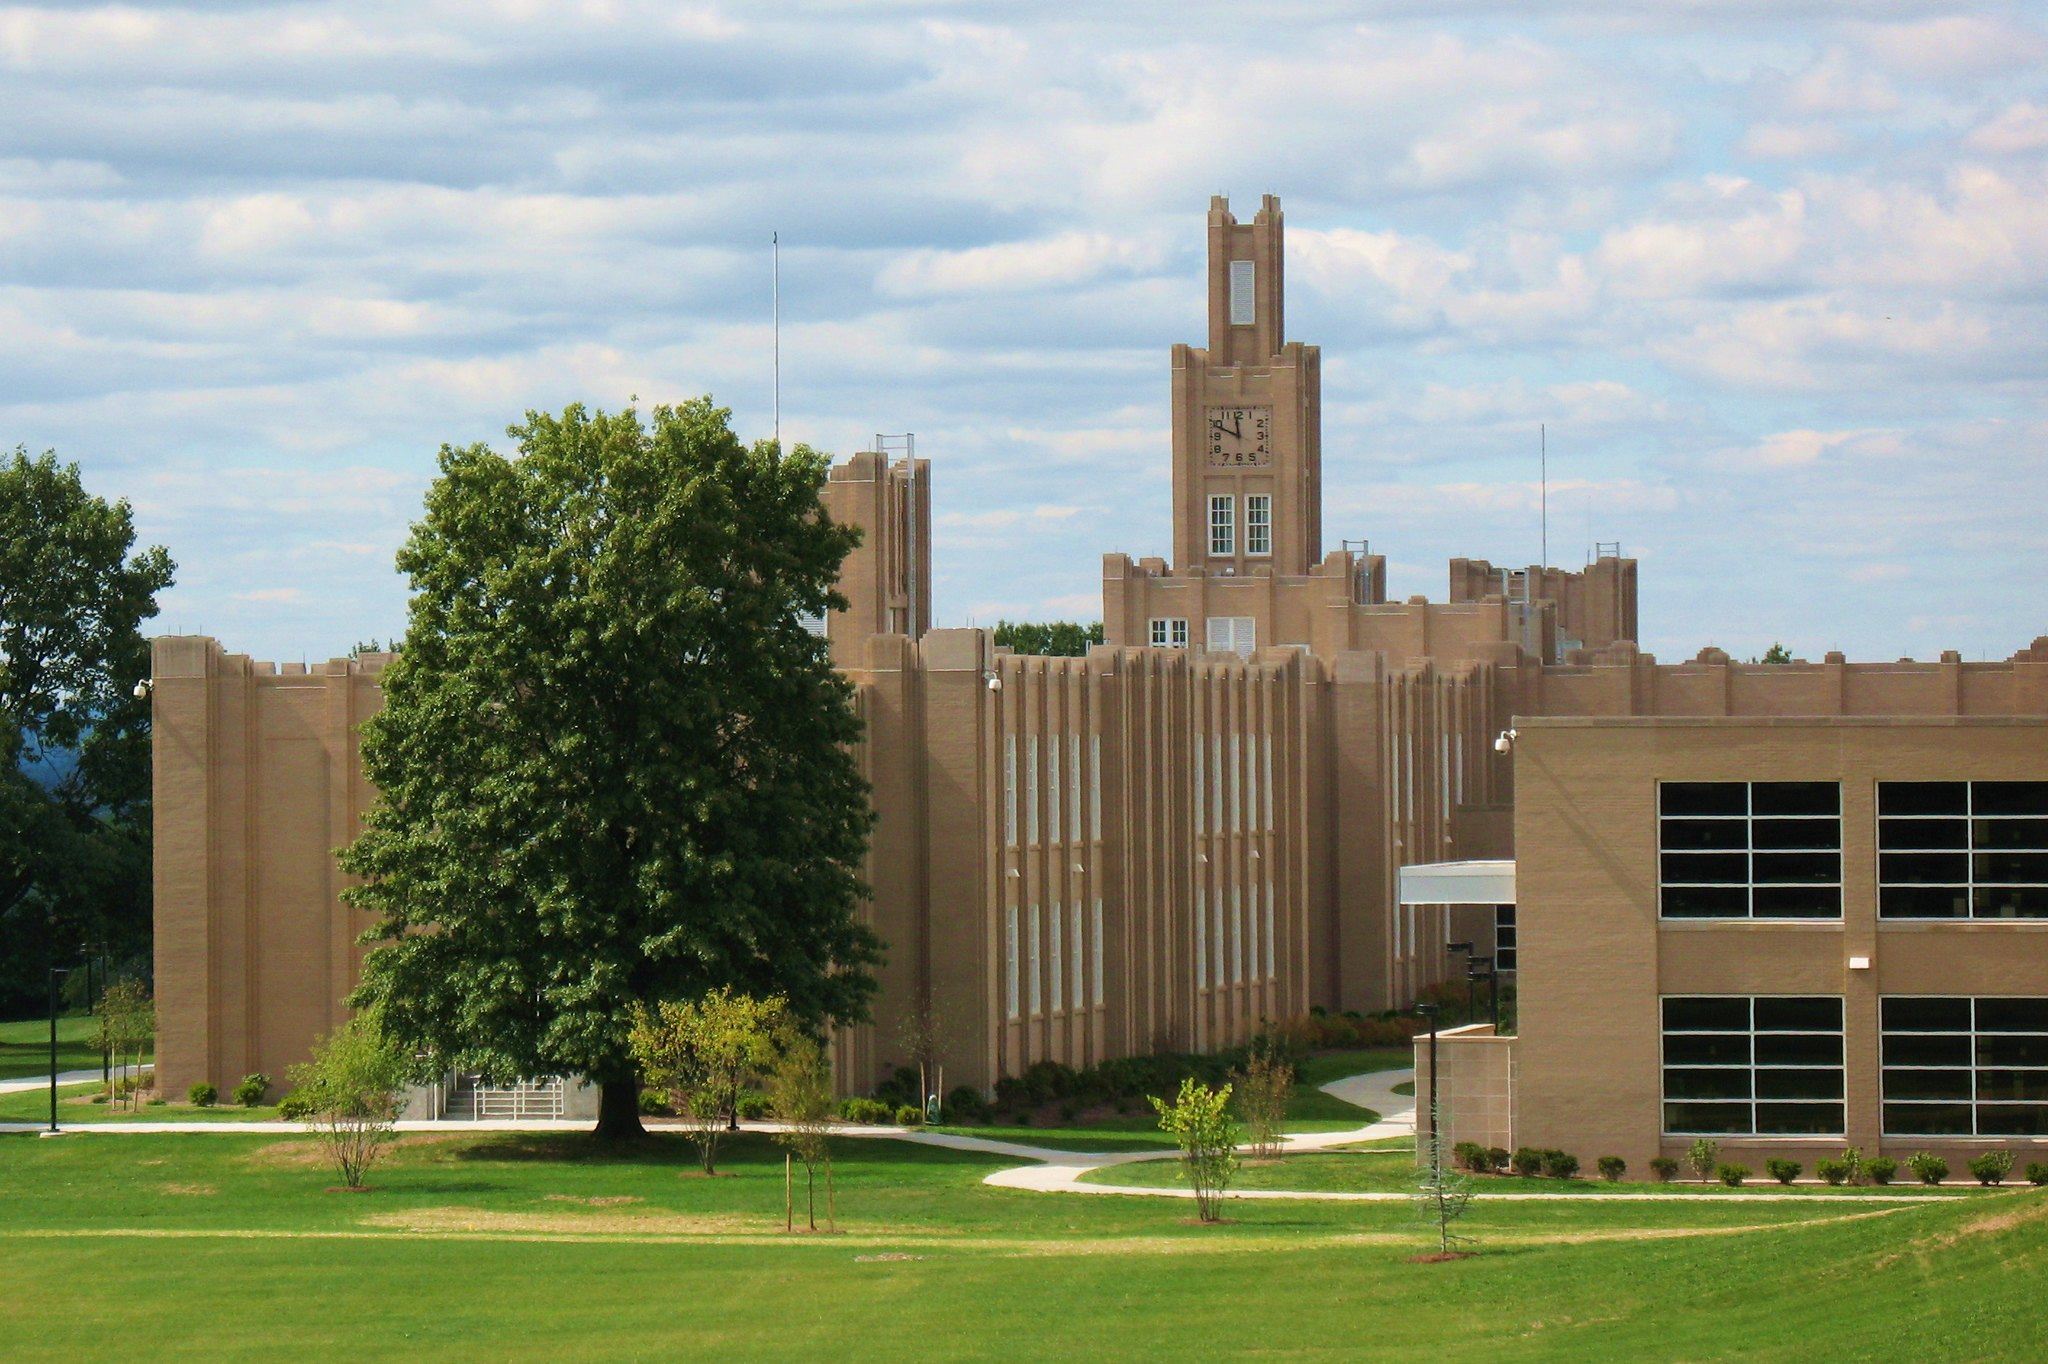 Photo of the Milton Hershey School